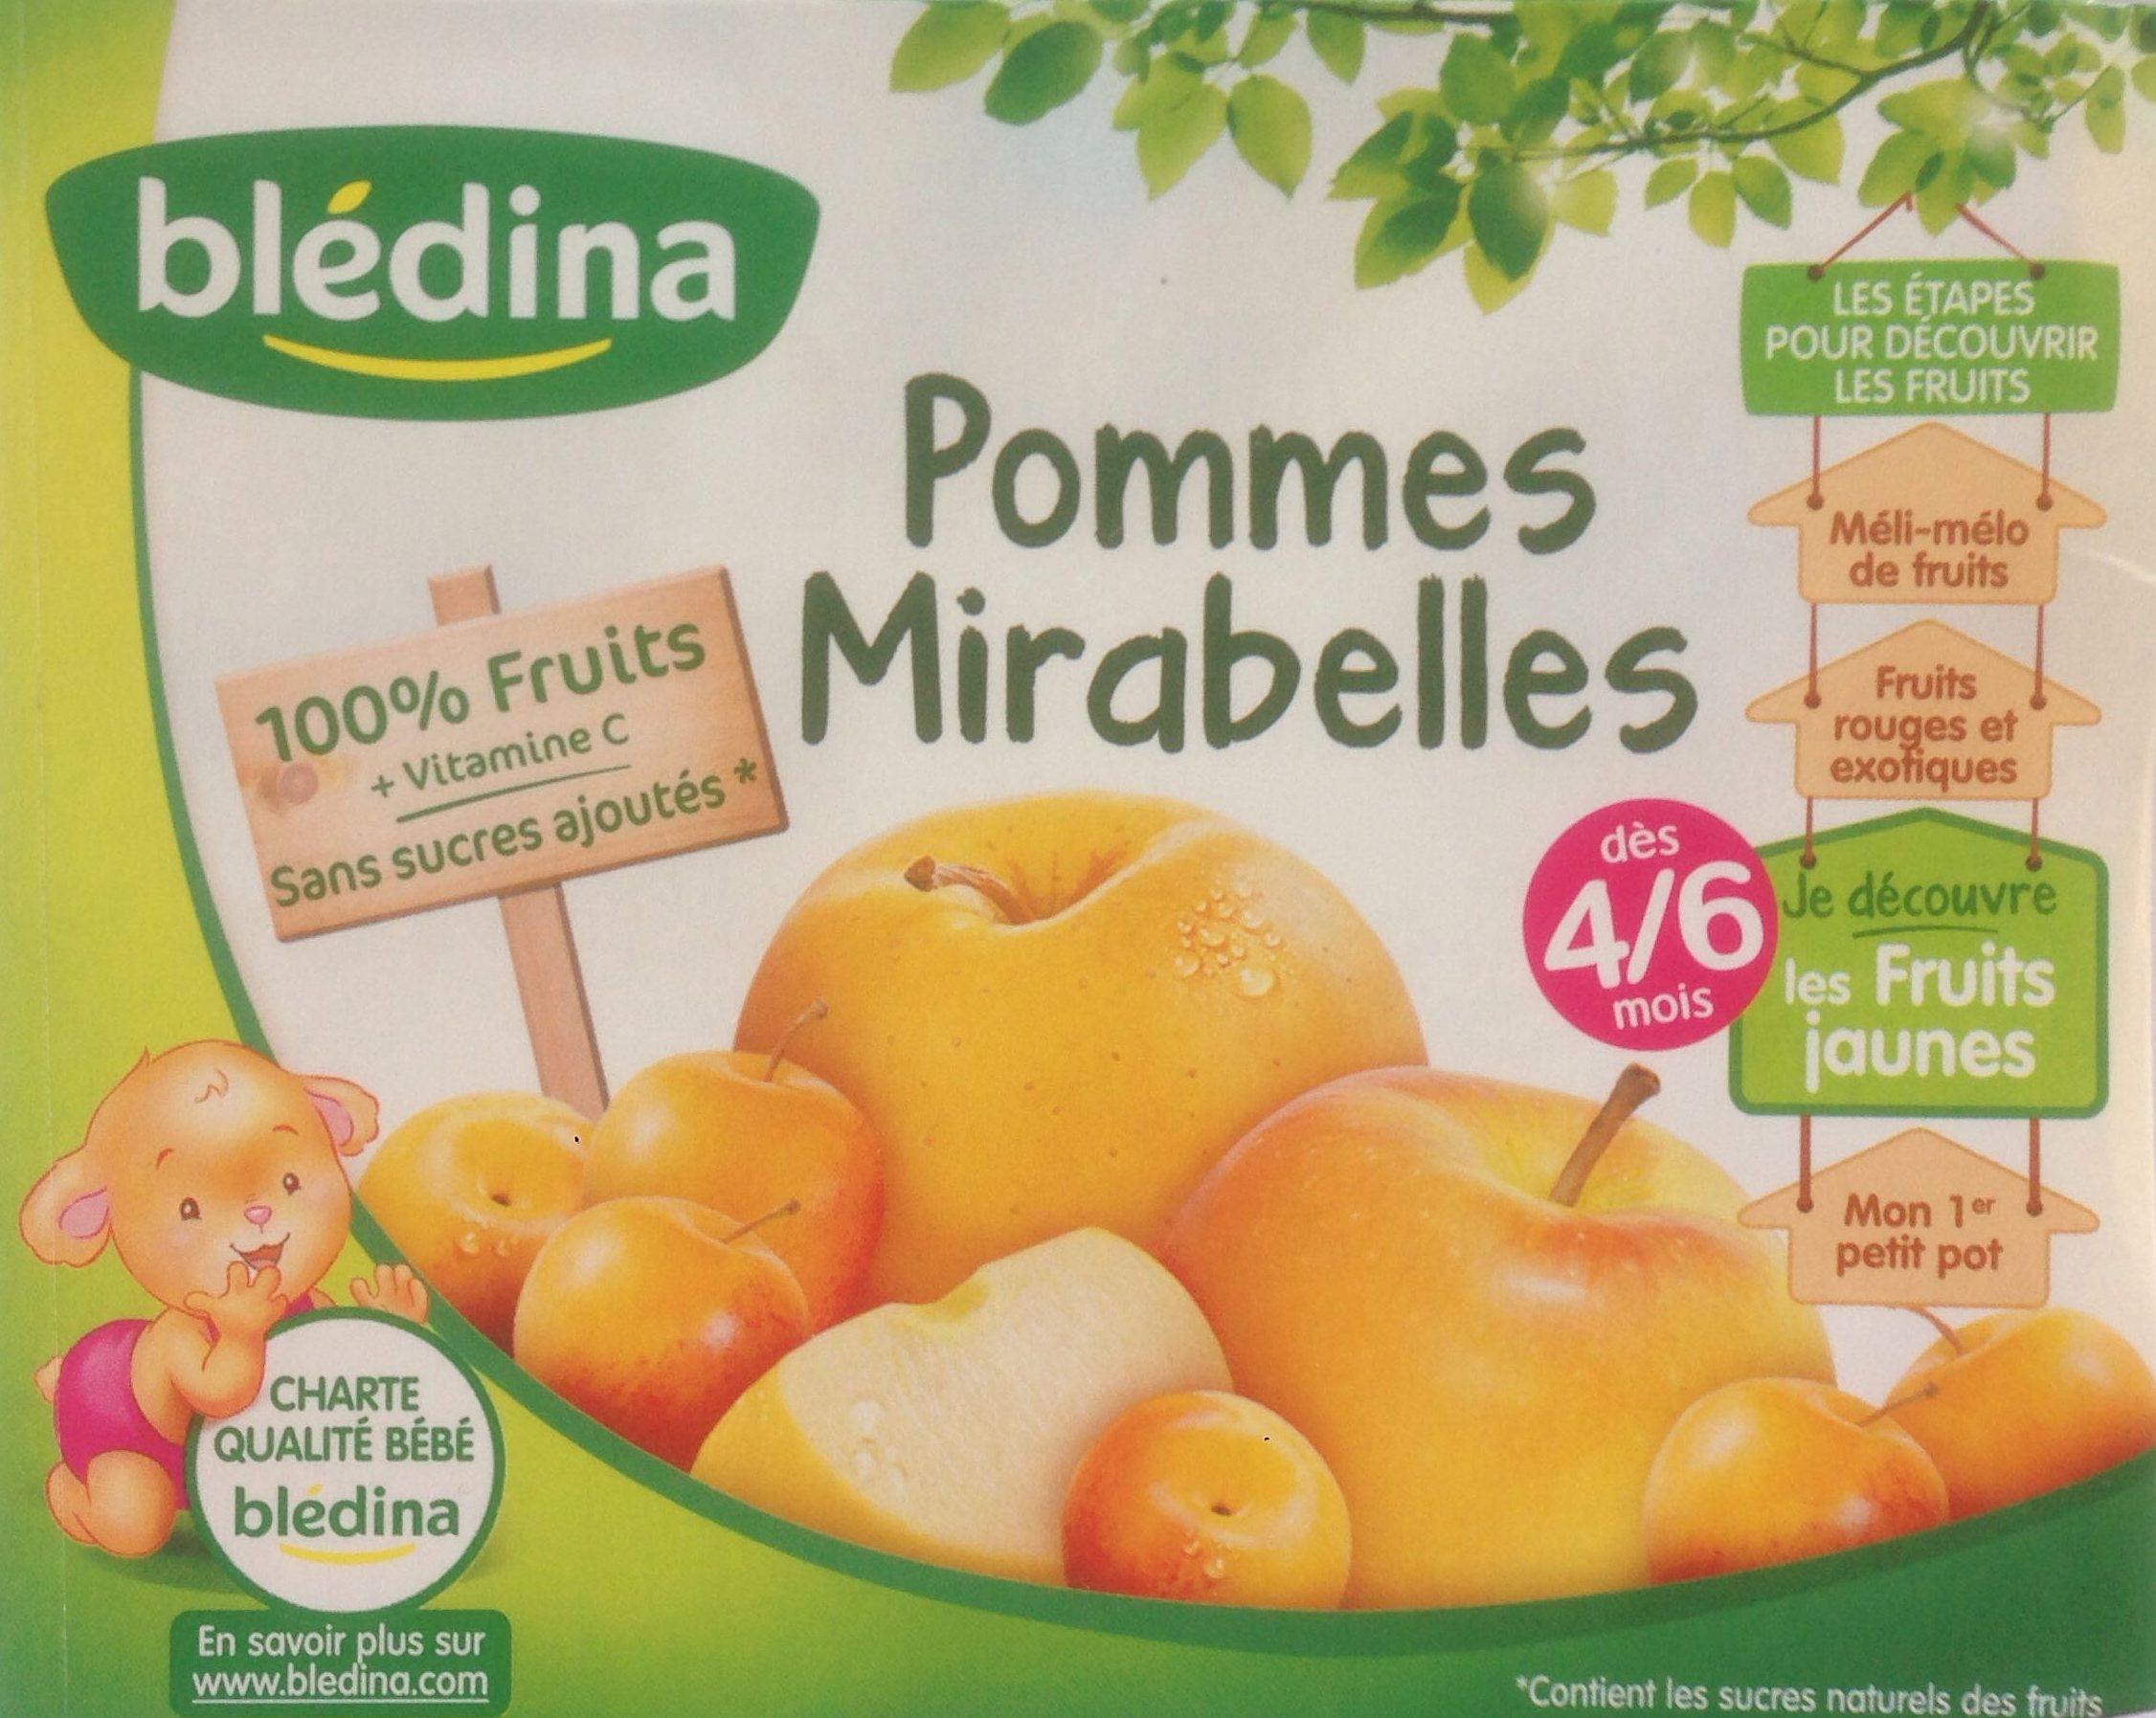 Pommes Mirabelles - Product - fr